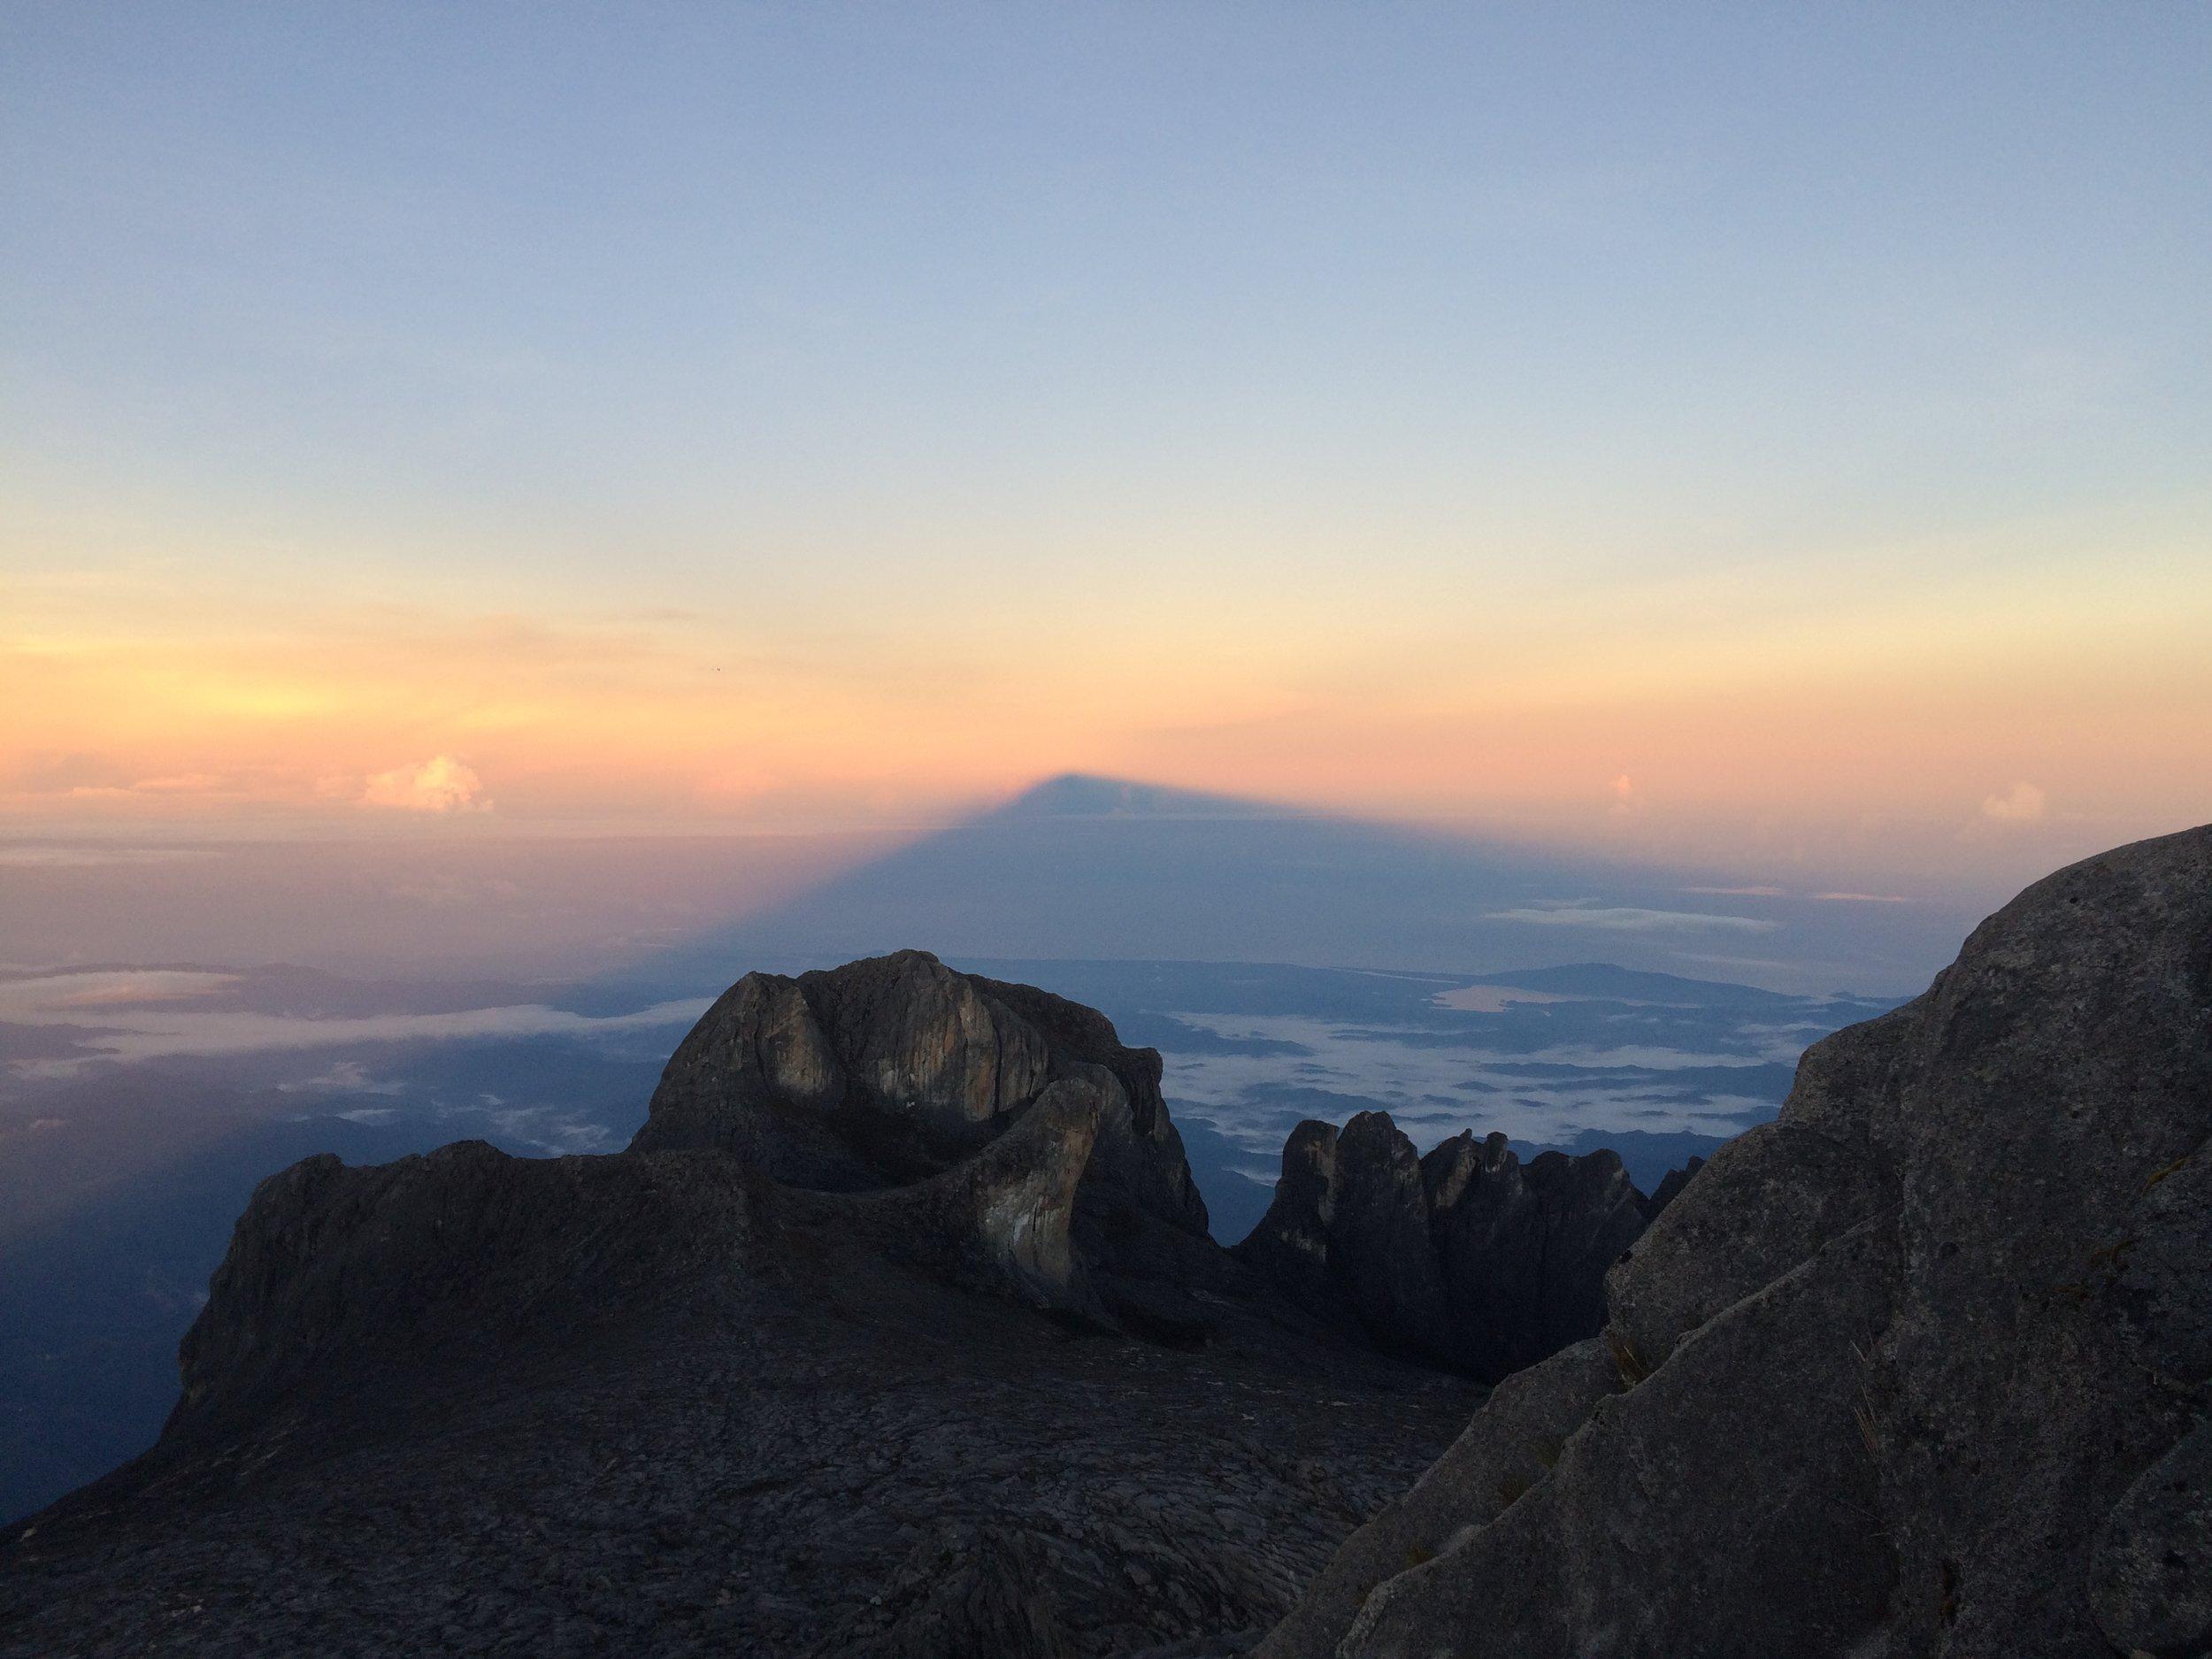 Sunrise at the summit!